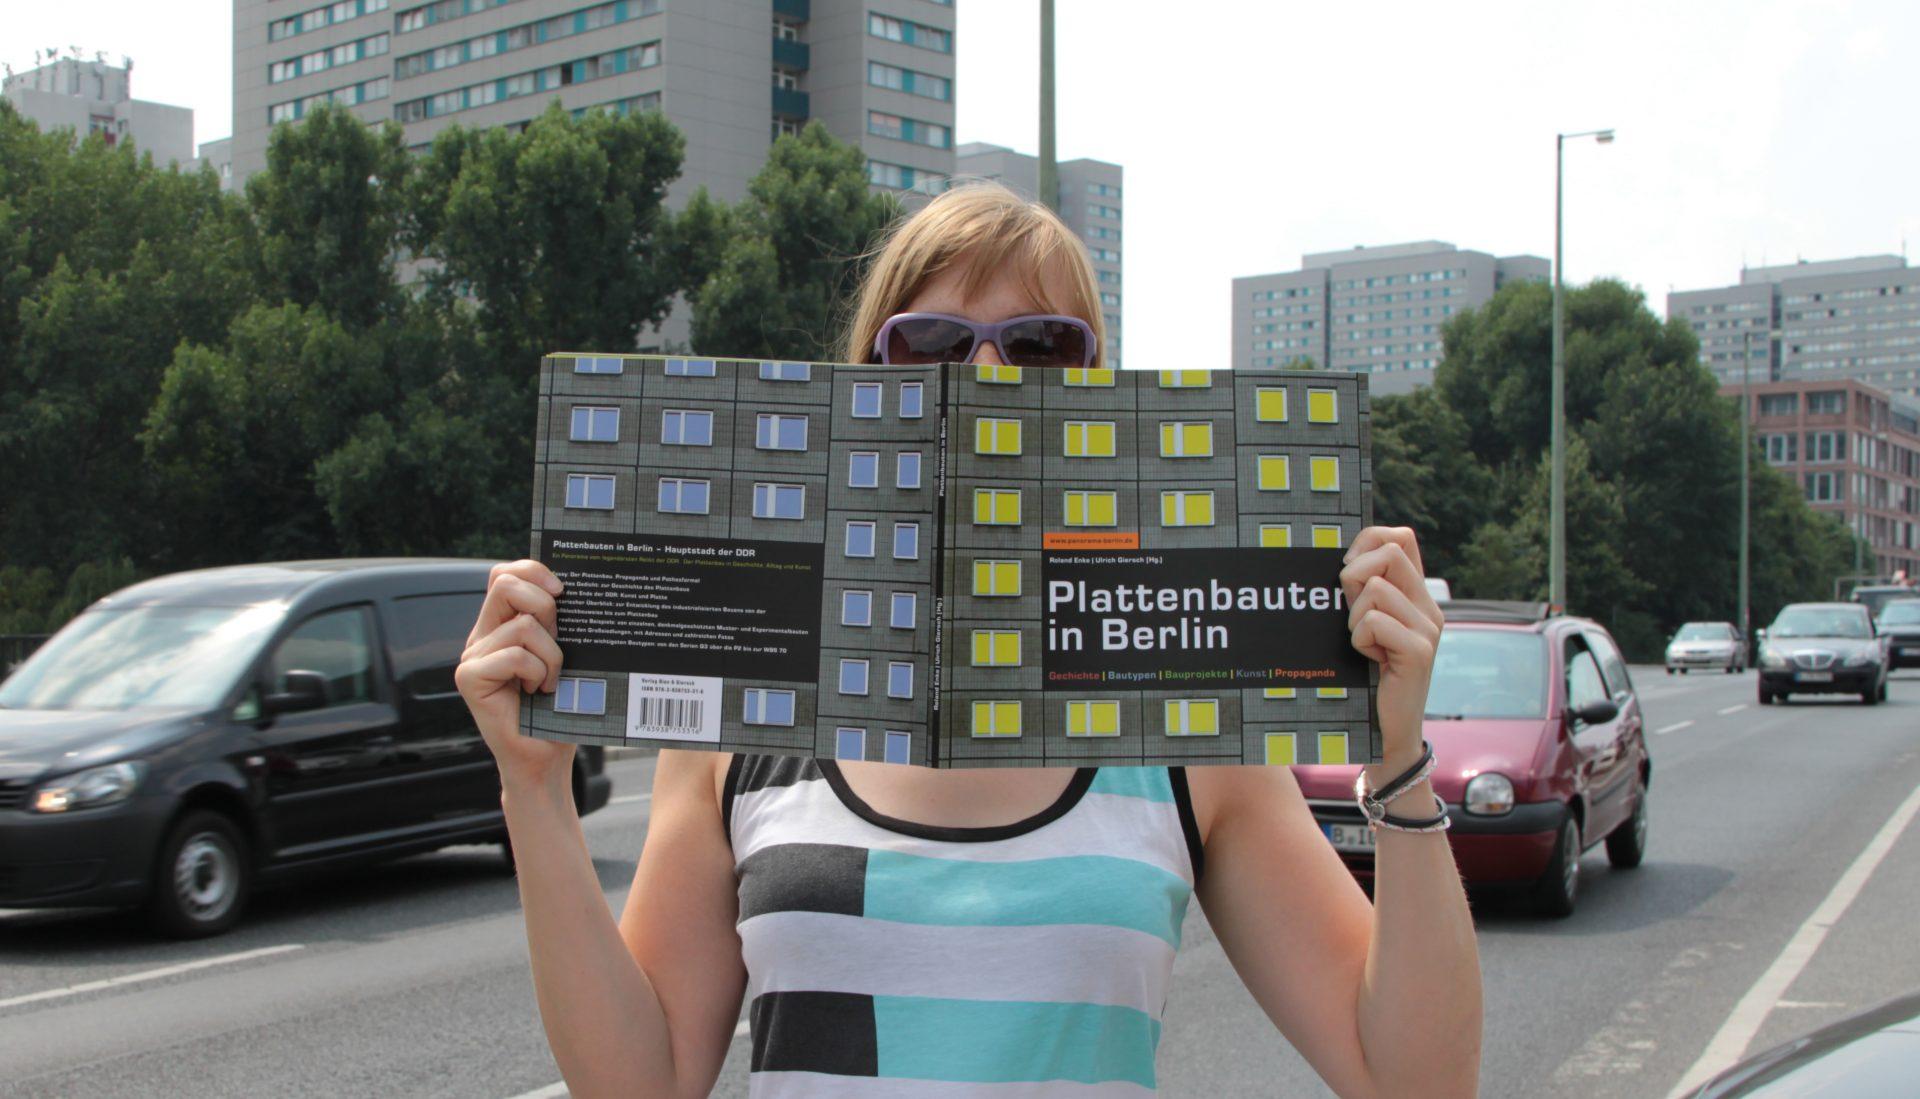 editorialdesign-panorama-plattenbau-copyright-typoly